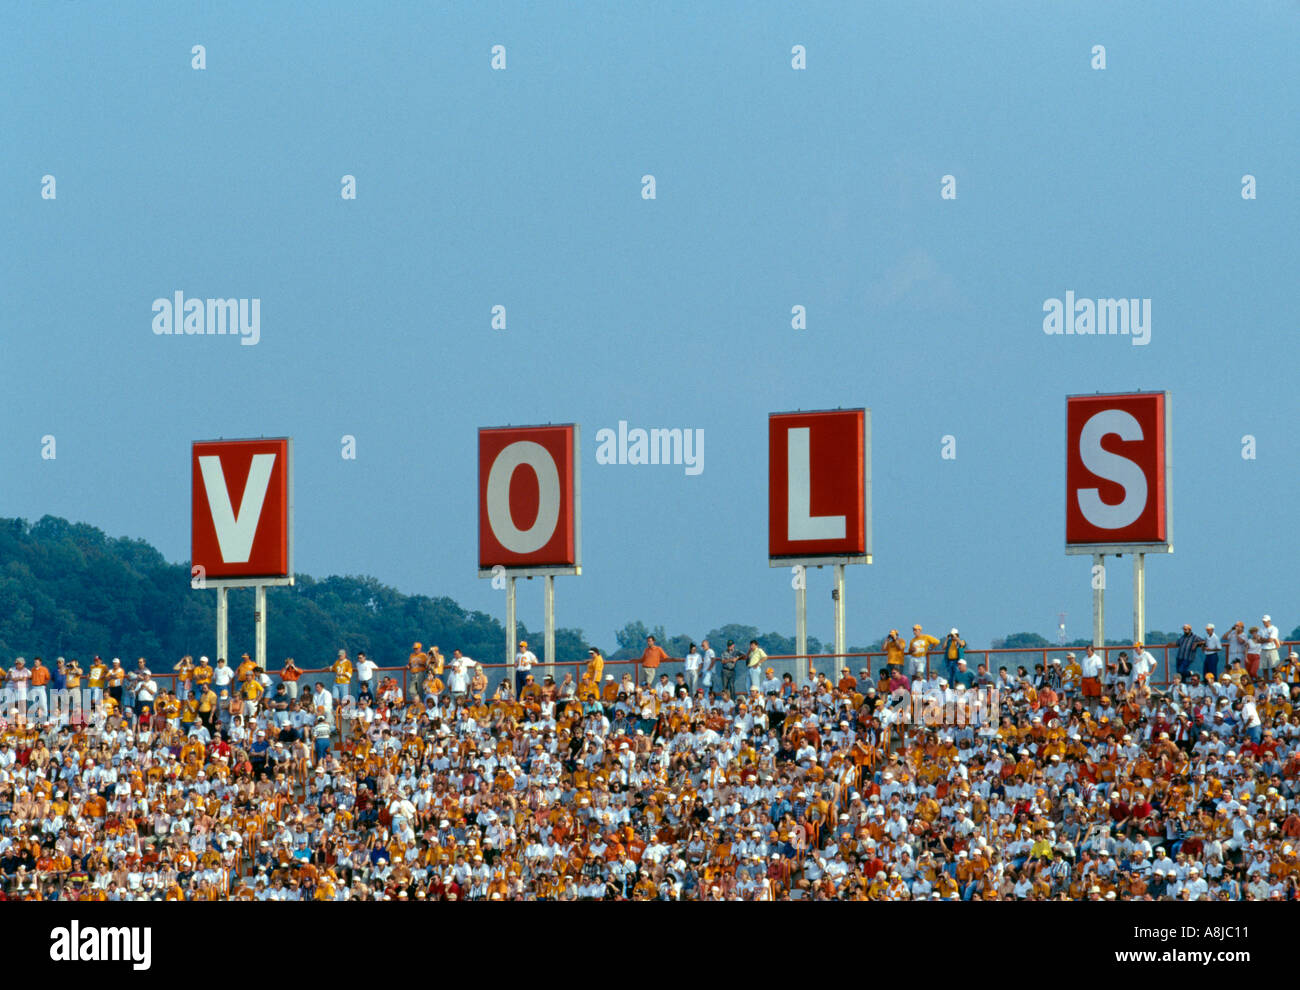 Crowd in UT stadium Knoxville TN - Stock Image